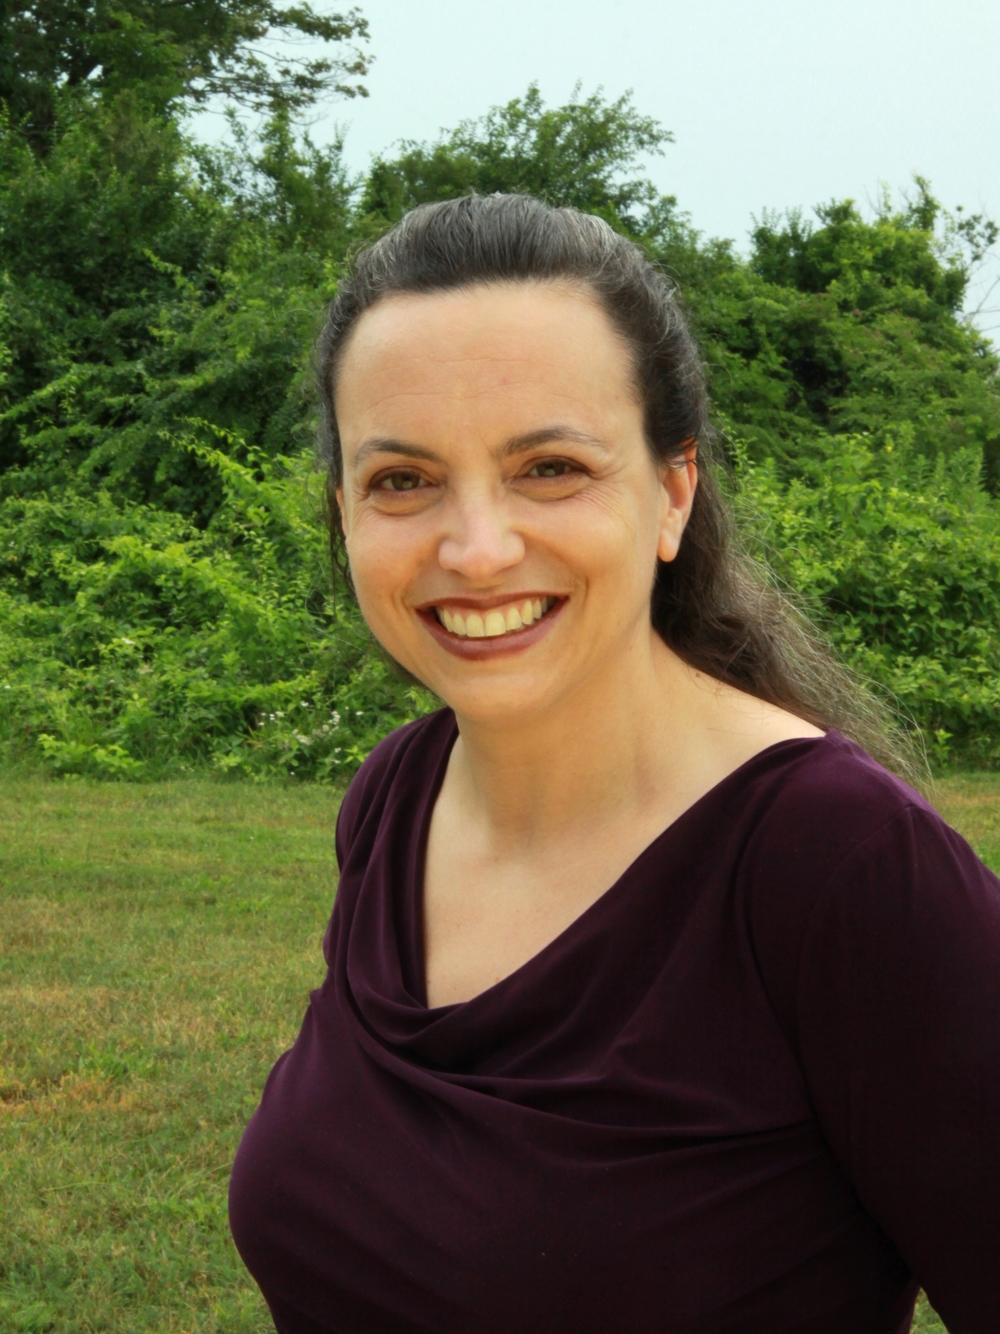 Sarah Meyers, Senior Consultant